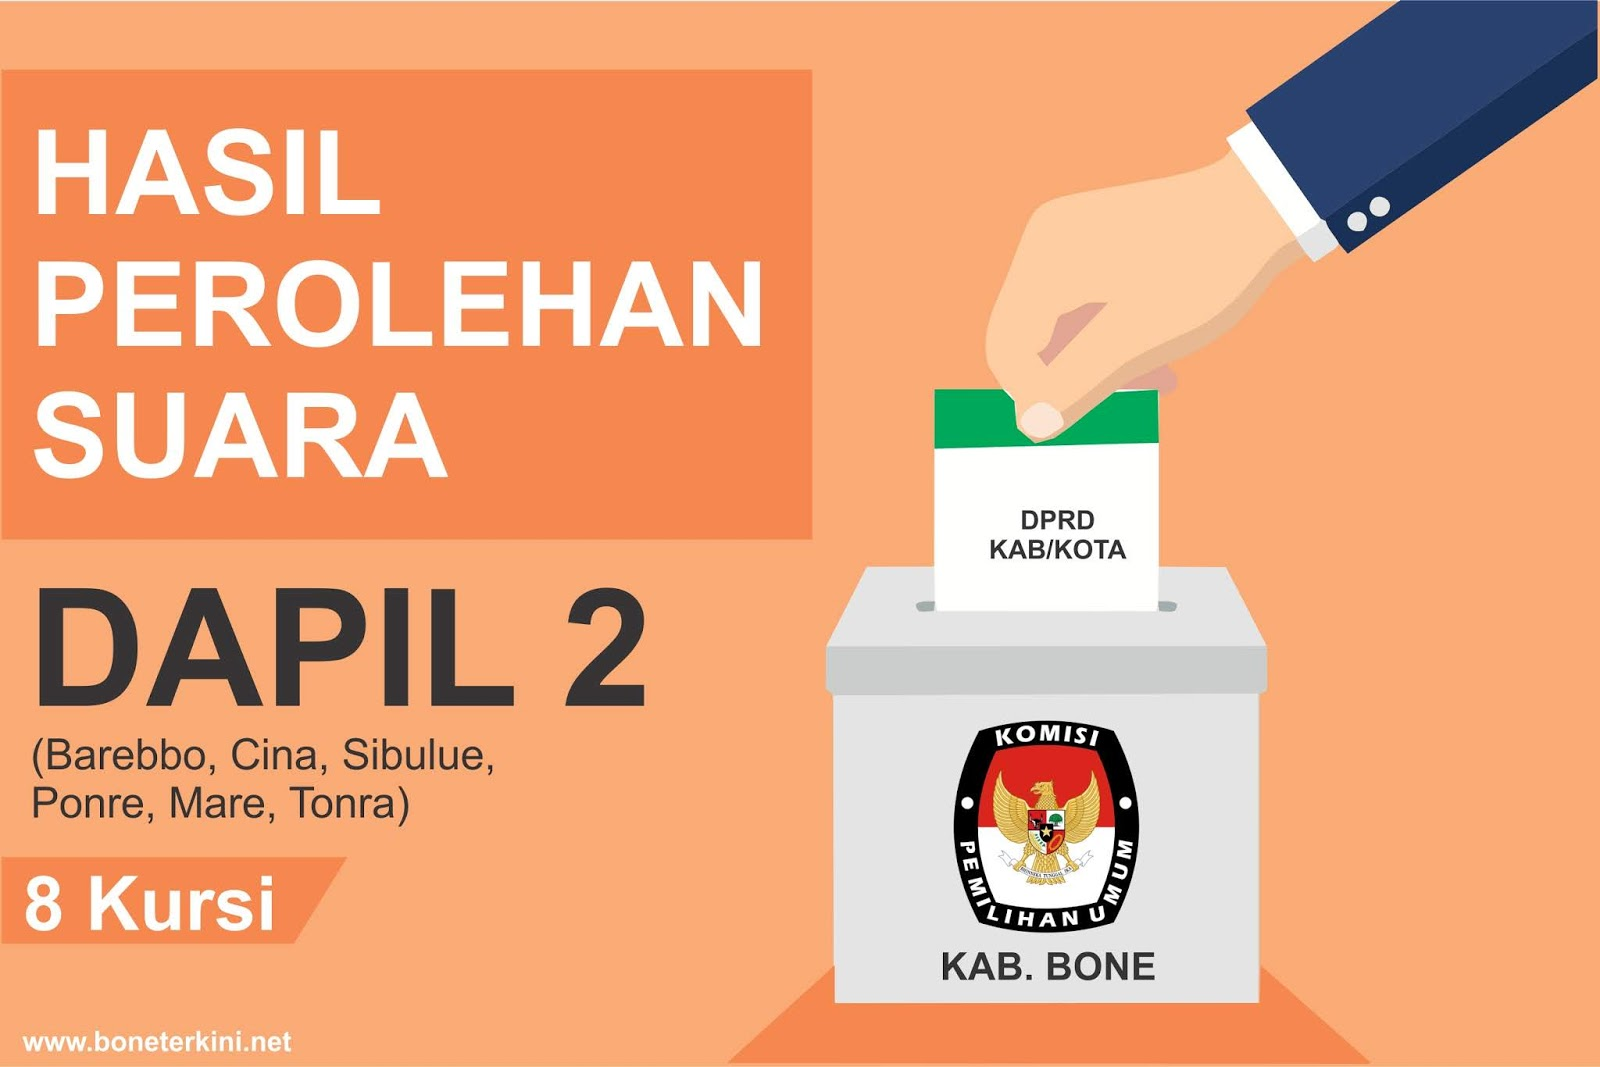 Ini Caleg Terpilih DPRD Kabupaten Bone Dapil 2 Hasil Rekapitulasi KPU